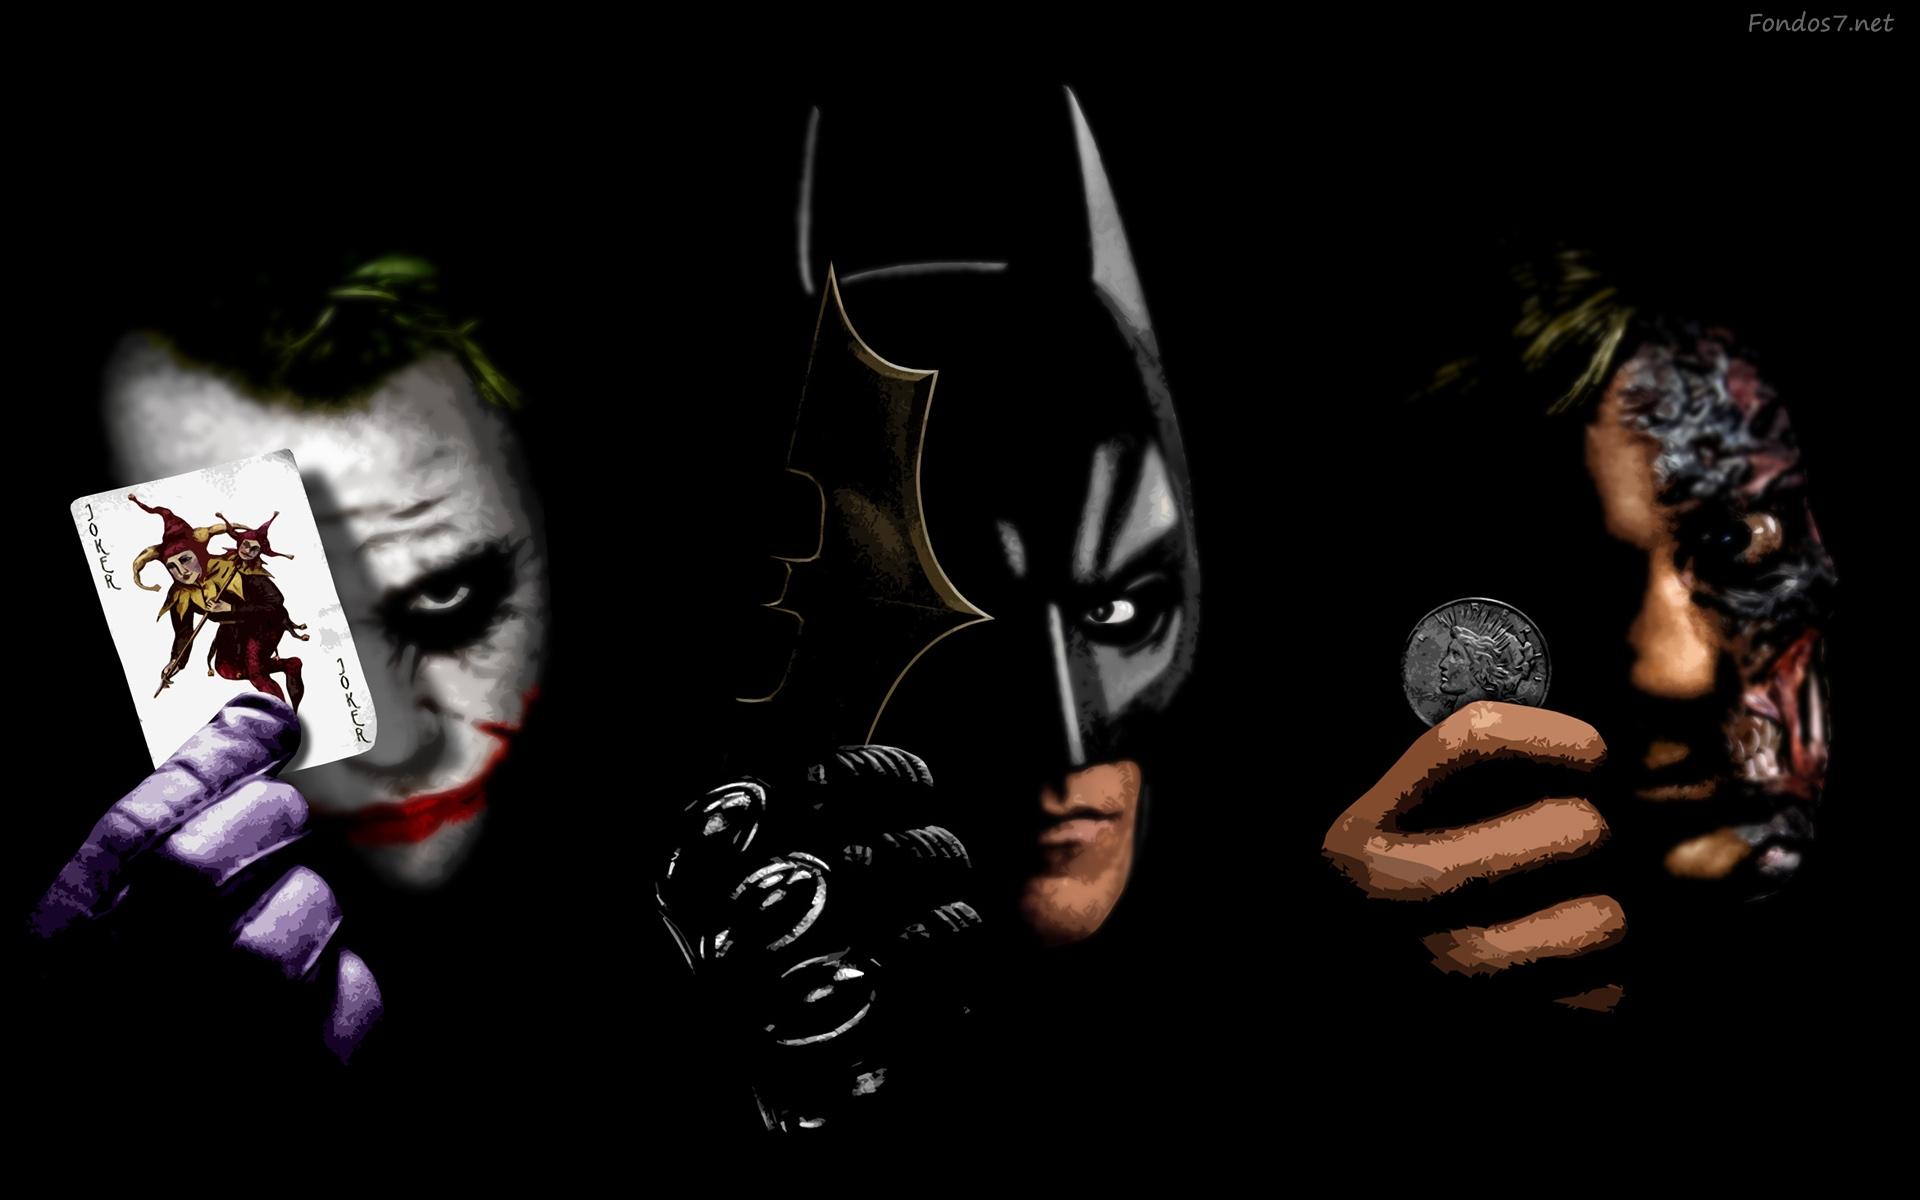 men wallpaper Enjoy this Batman background Batman background 1920x1200